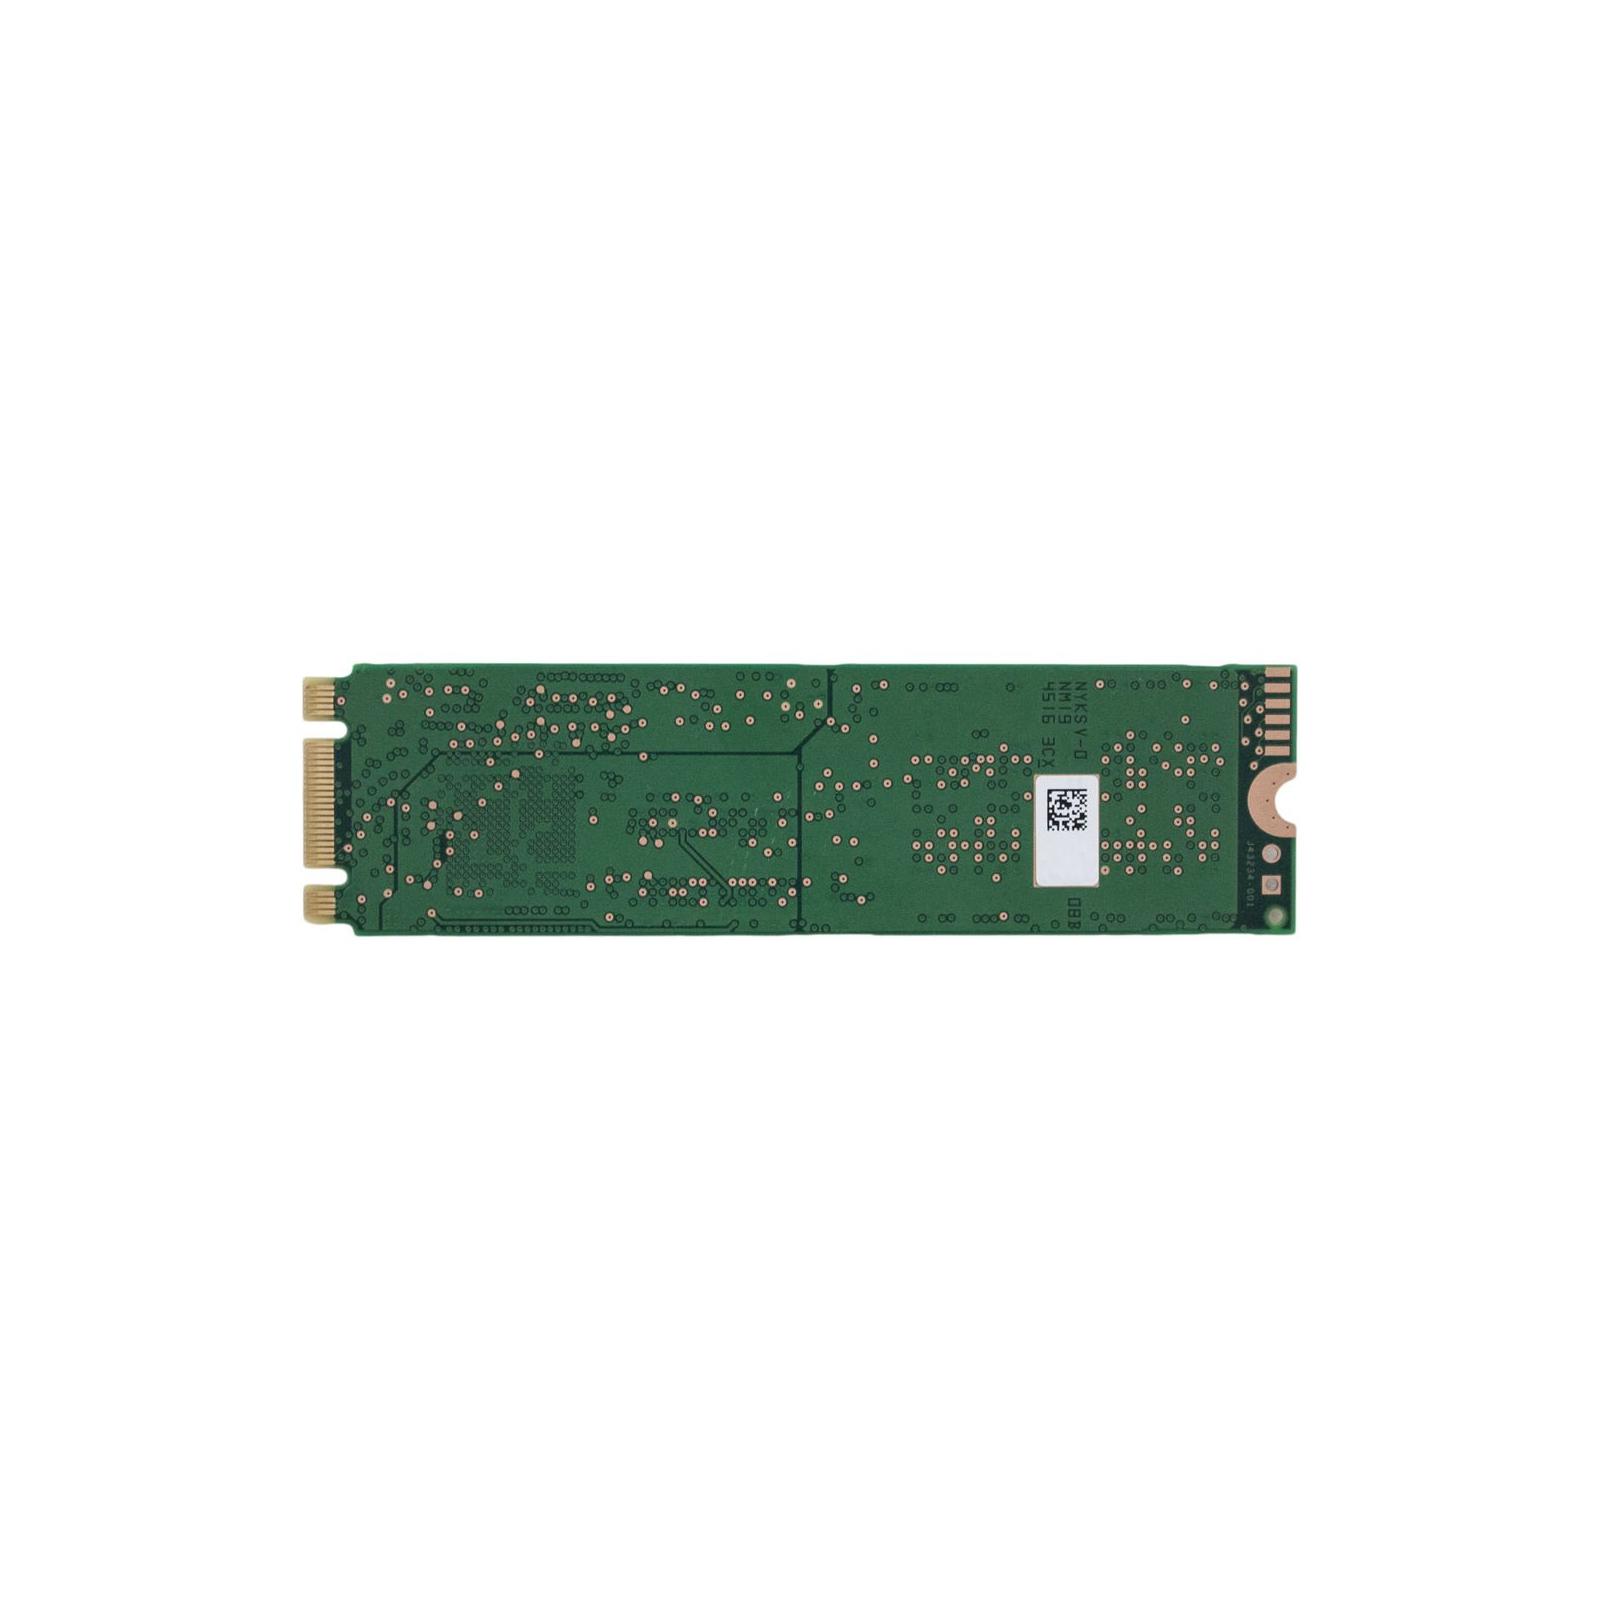 Накопитель SSD M.2 2280 128GB INTEL (SSDSCKKW128G8X1) изображение 5